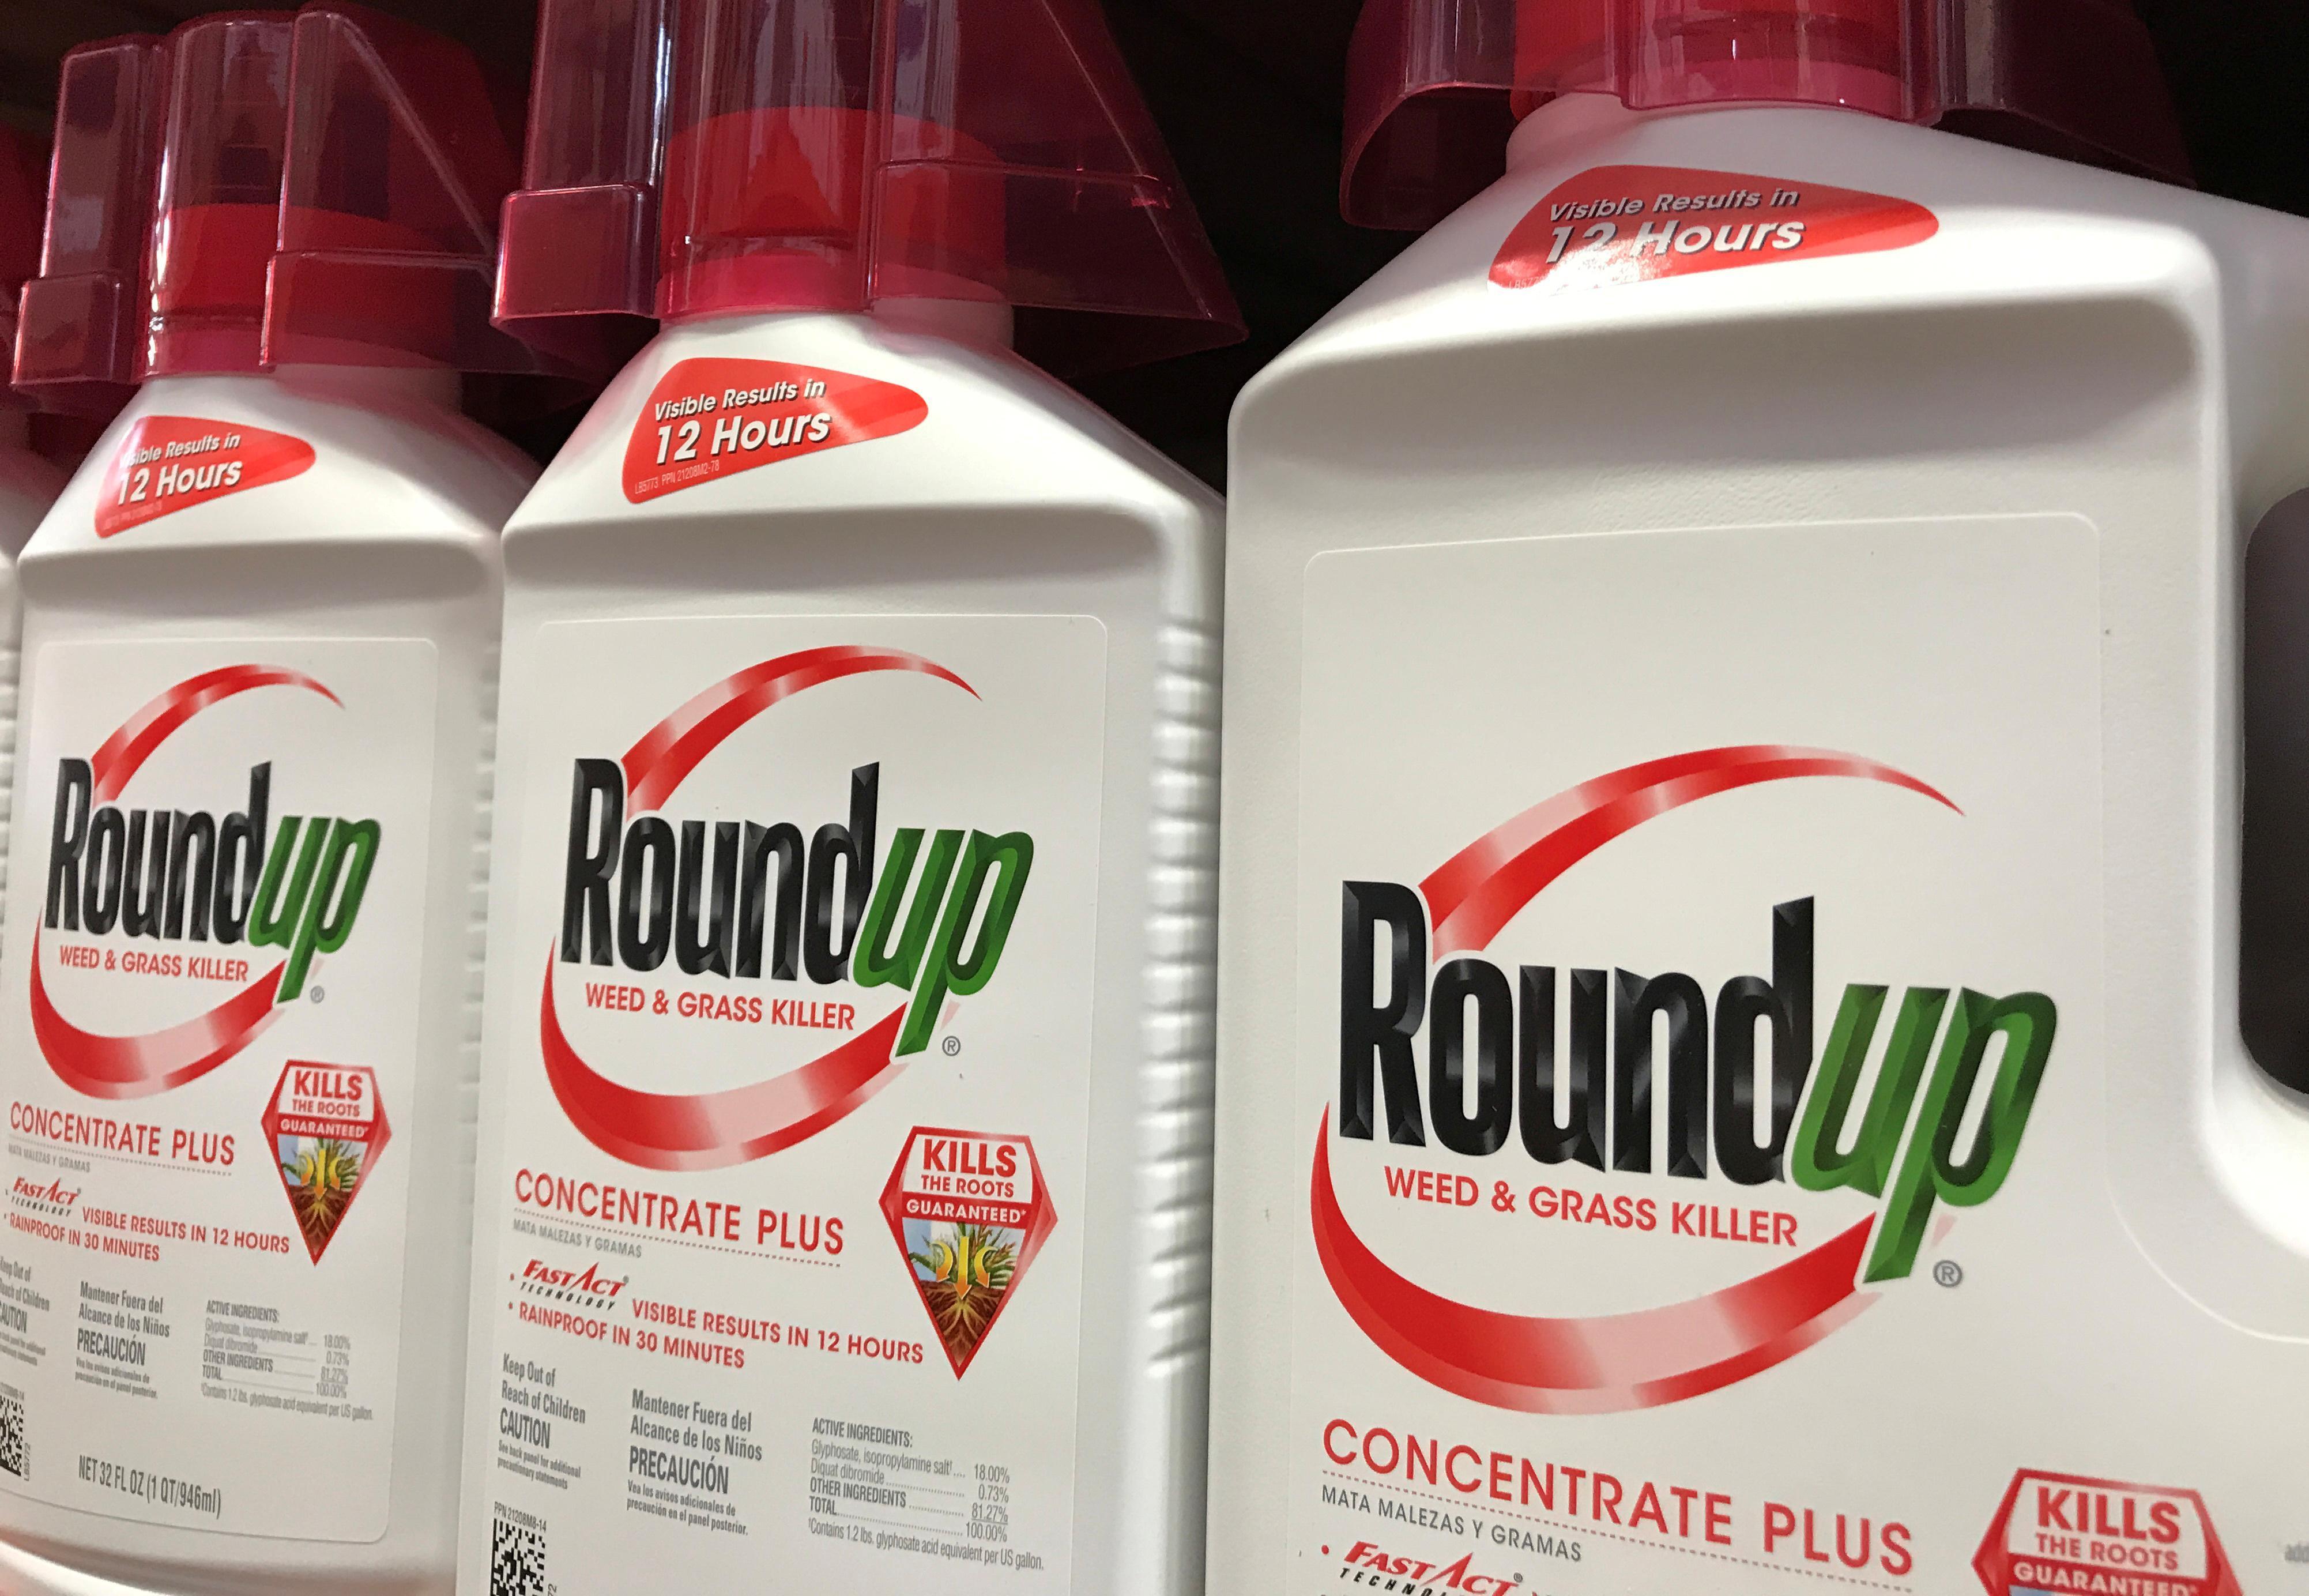 Juror urges U.S. judge to uphold $80 million Roundup verdict against Bayer